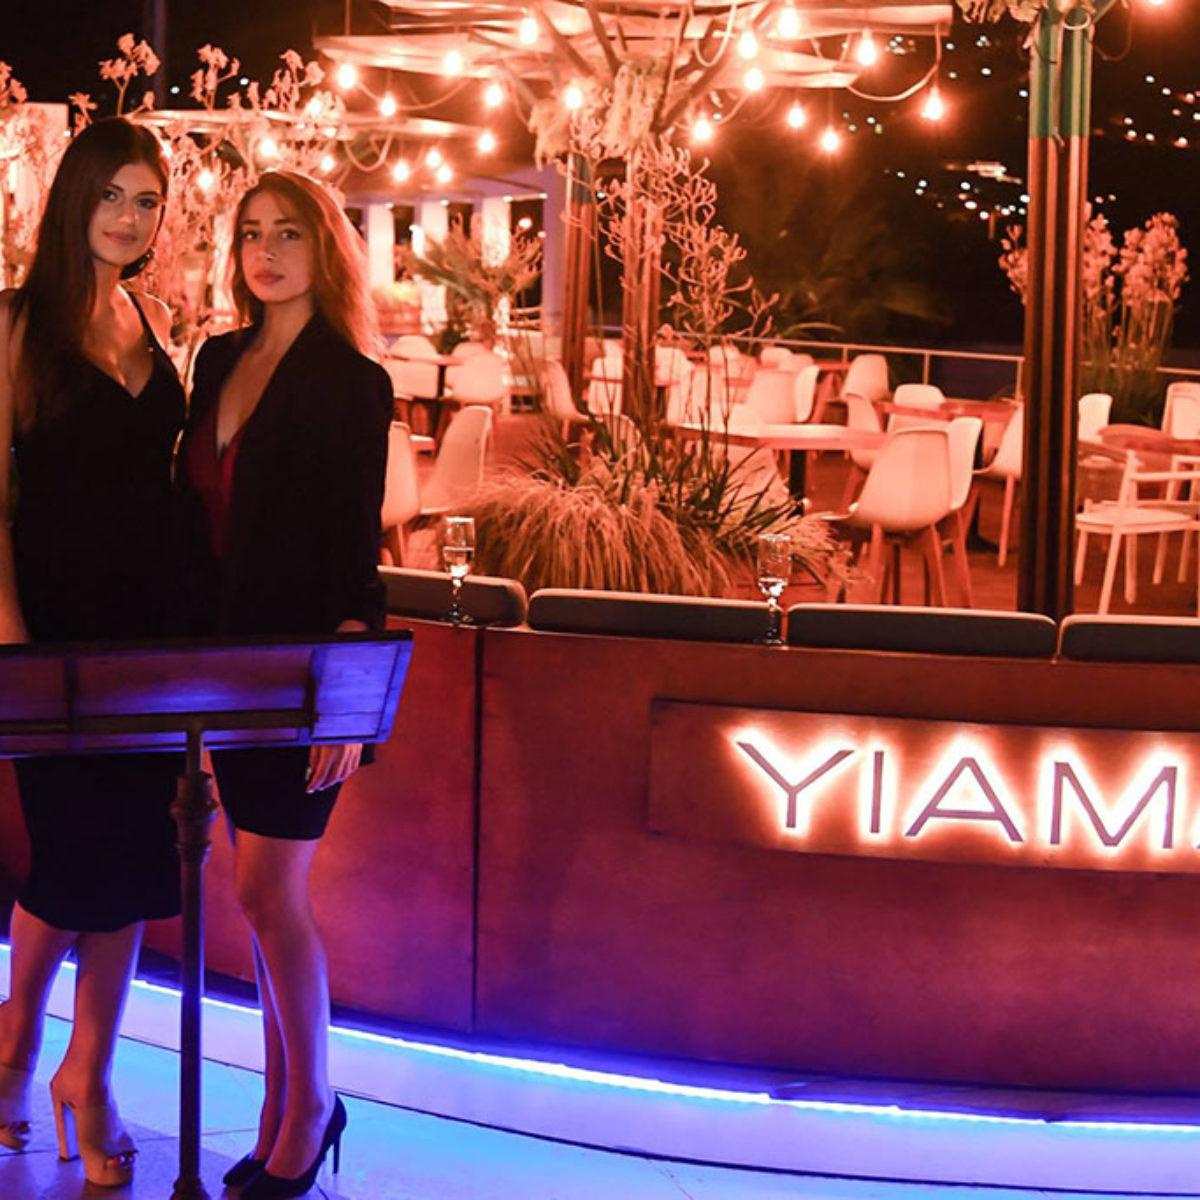 Yiamas Gastro Bar - Καλαμάτα - Μοντέρνα Ευρωπαϊκή Κουζίνα - Team 4